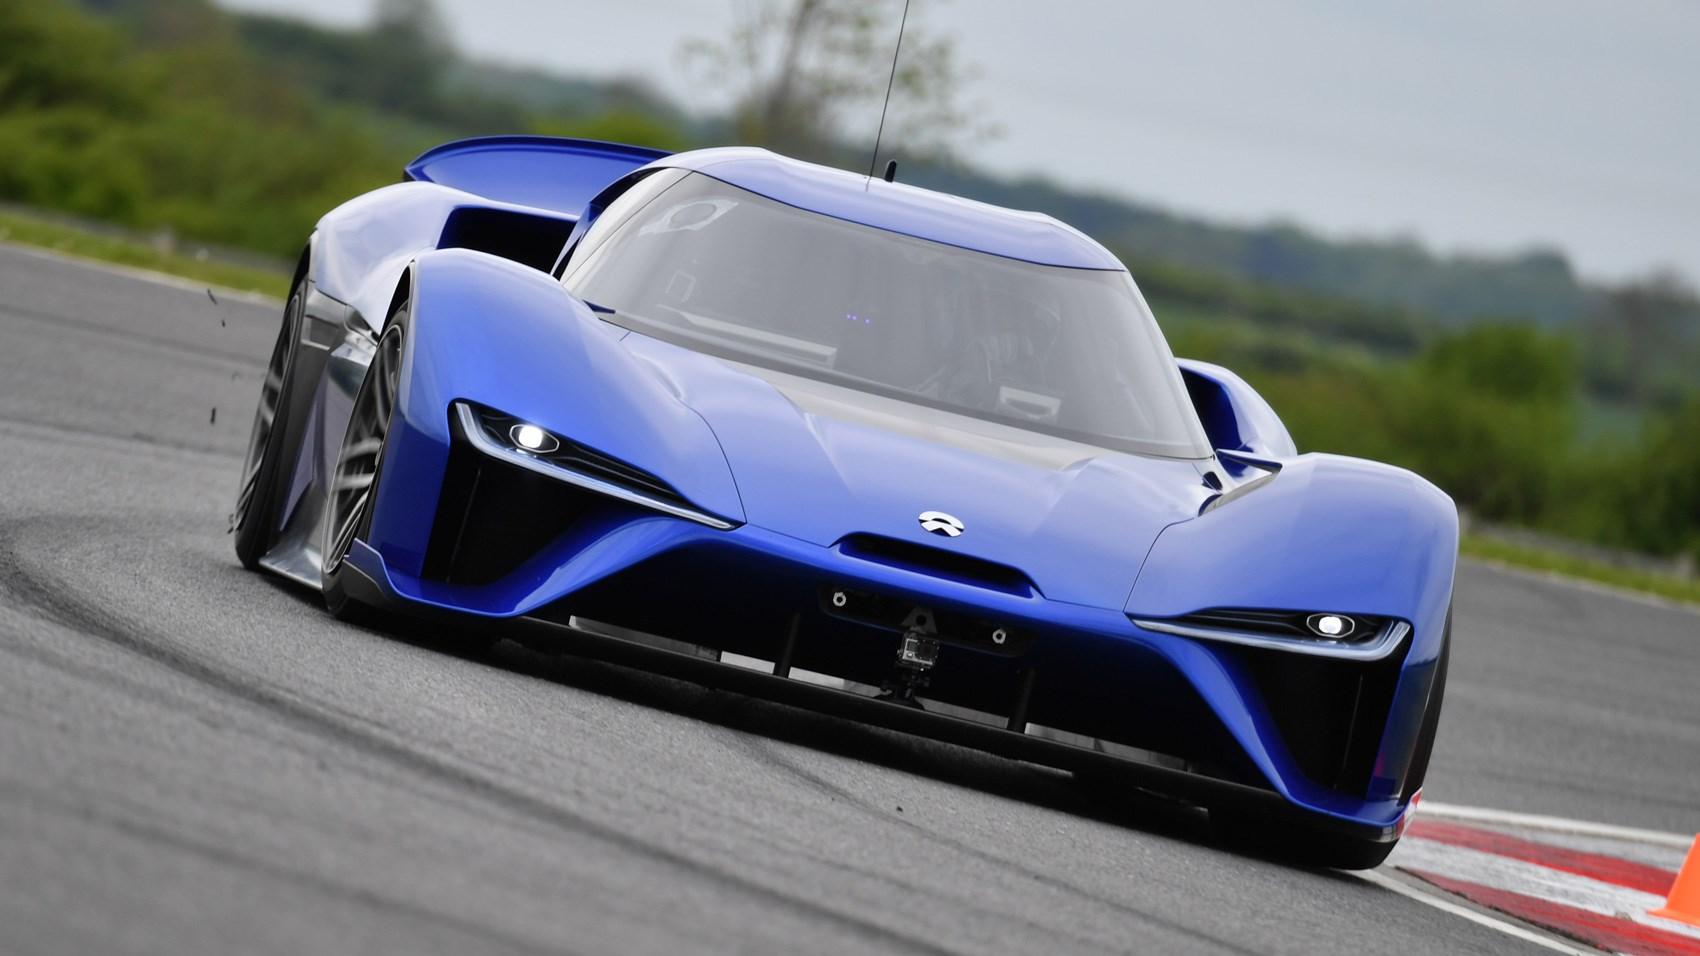 Top 10 Upcoming New Sedan Cars For 2019: Nio EP9 (2017) Review